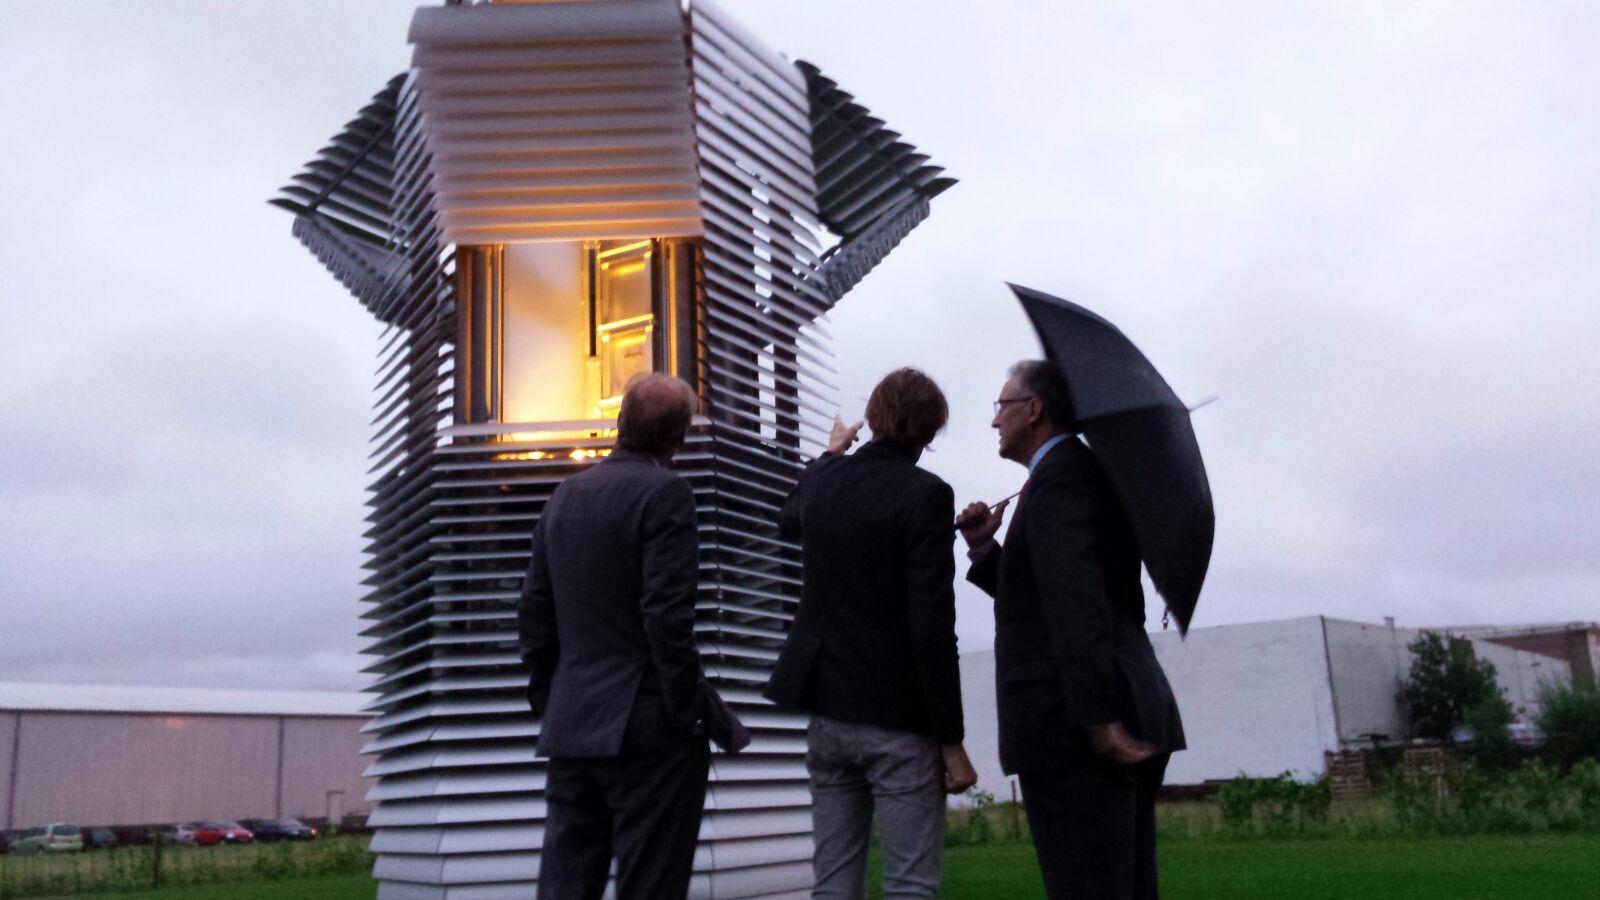 aboutaleb_and_daan_roosegaarde_opening_smog_free_tower_rotterdam